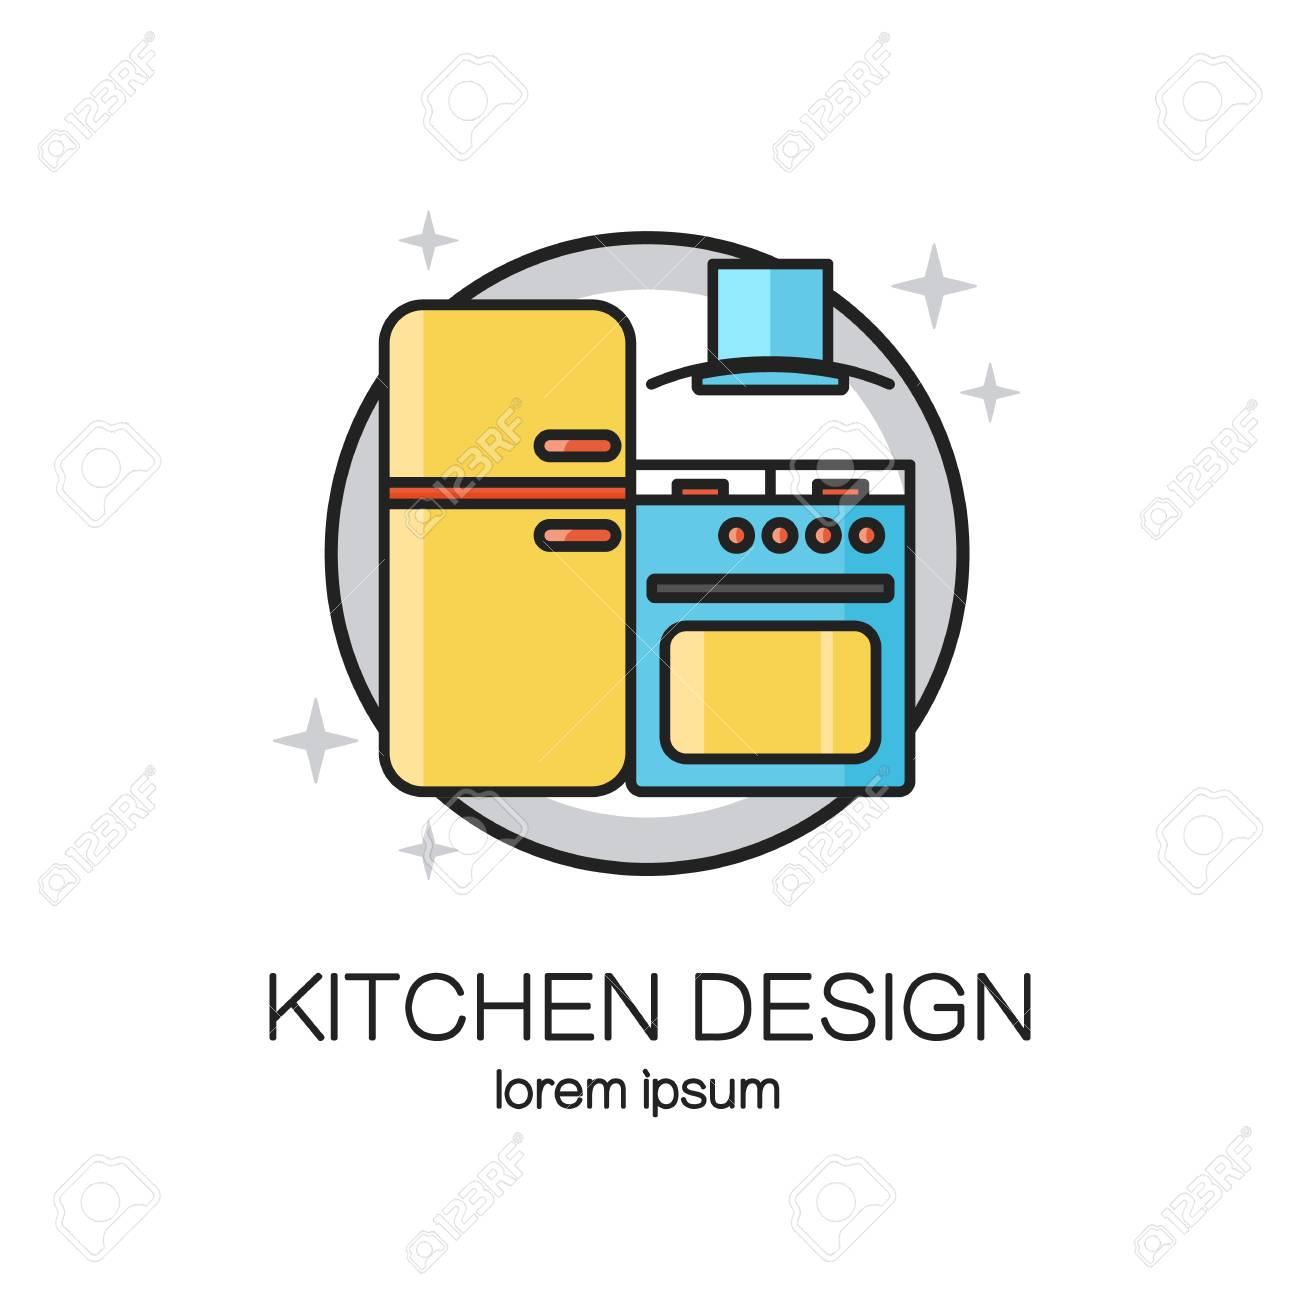 kitchen design line icon web template royalty free cliparts vectors